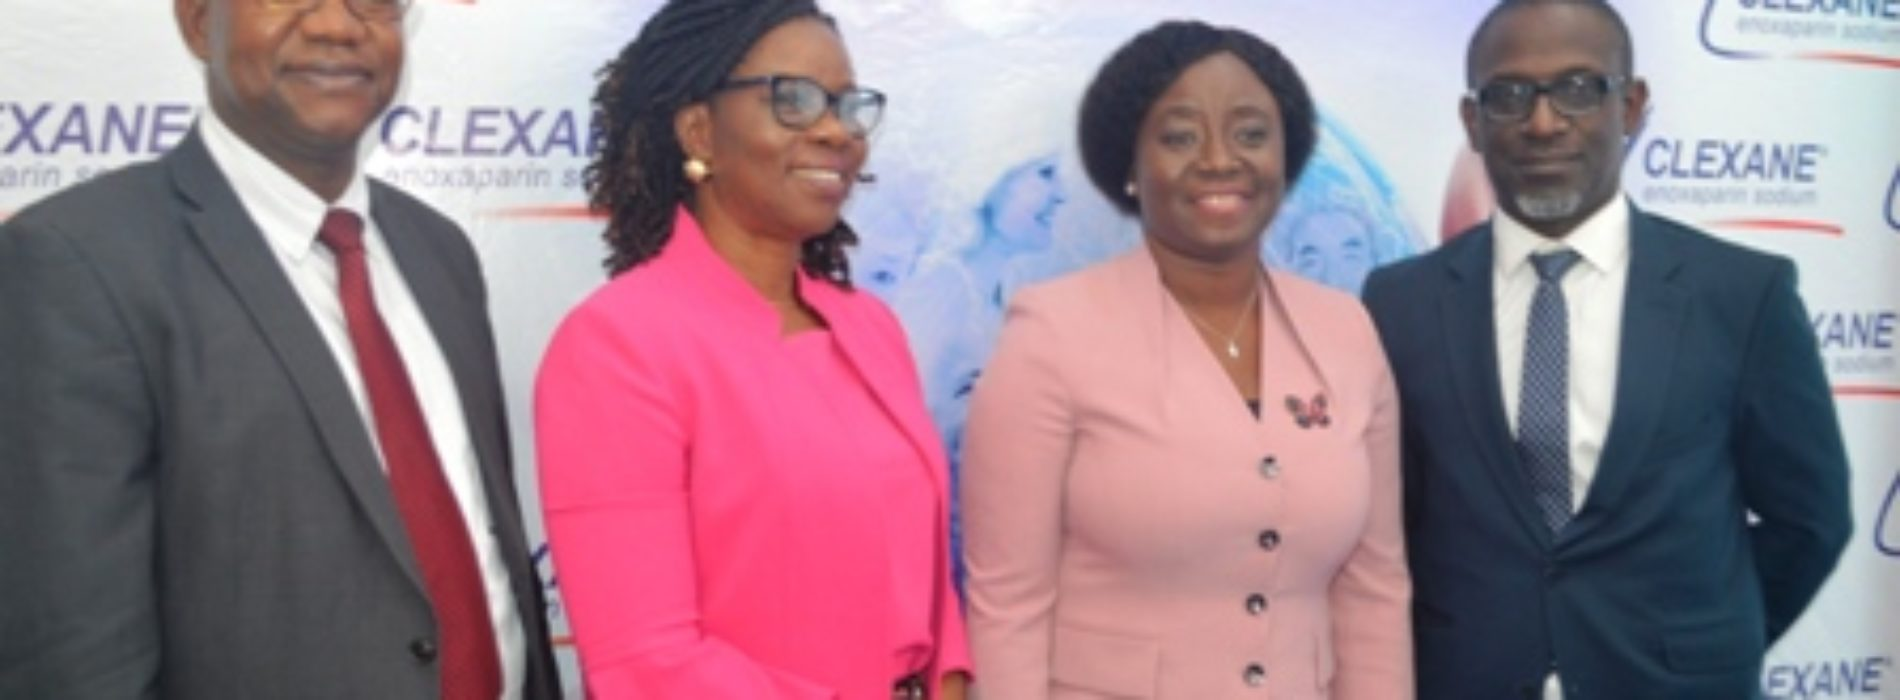 Sanofi steps up campaign against thrombosis